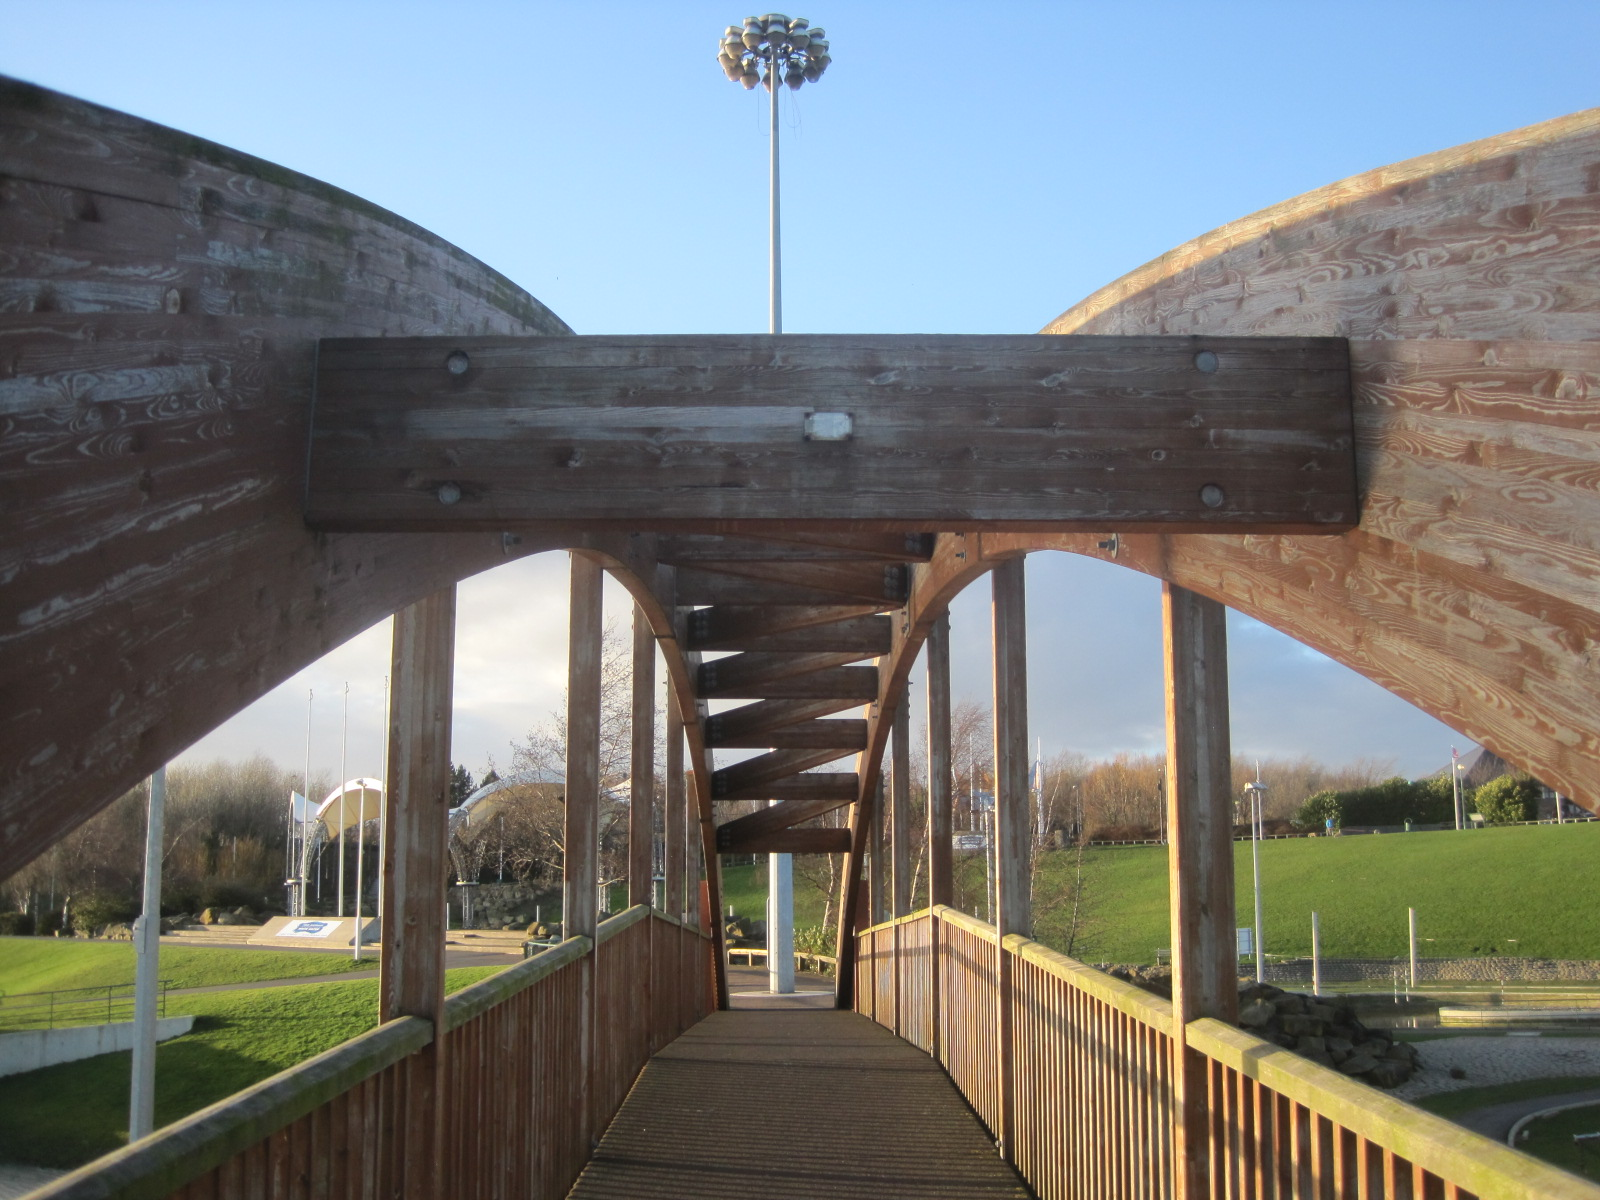 A completely different bridge